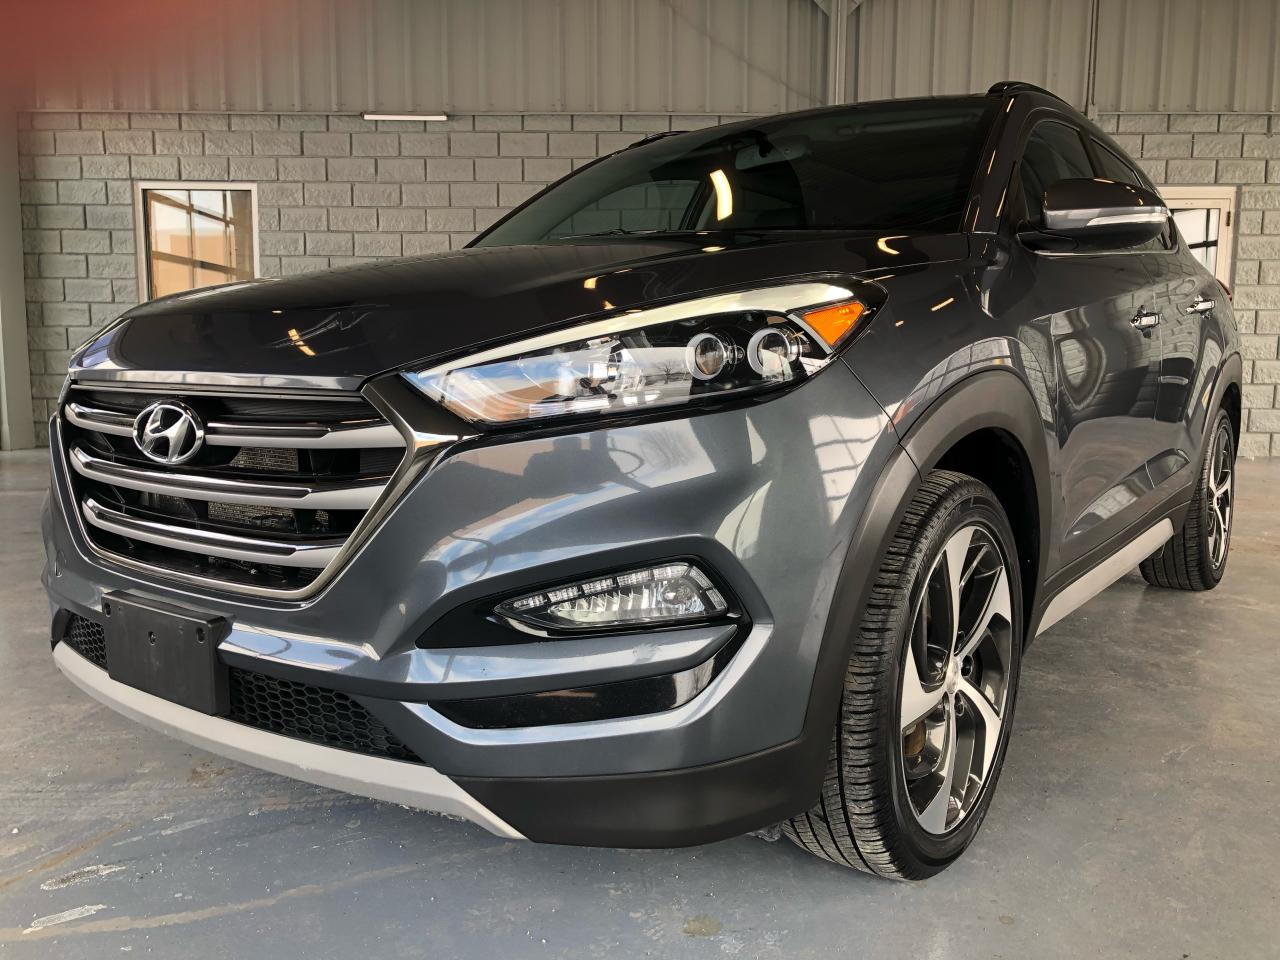 2017 Hyundai Tucson 1.6T AWD LIMITED